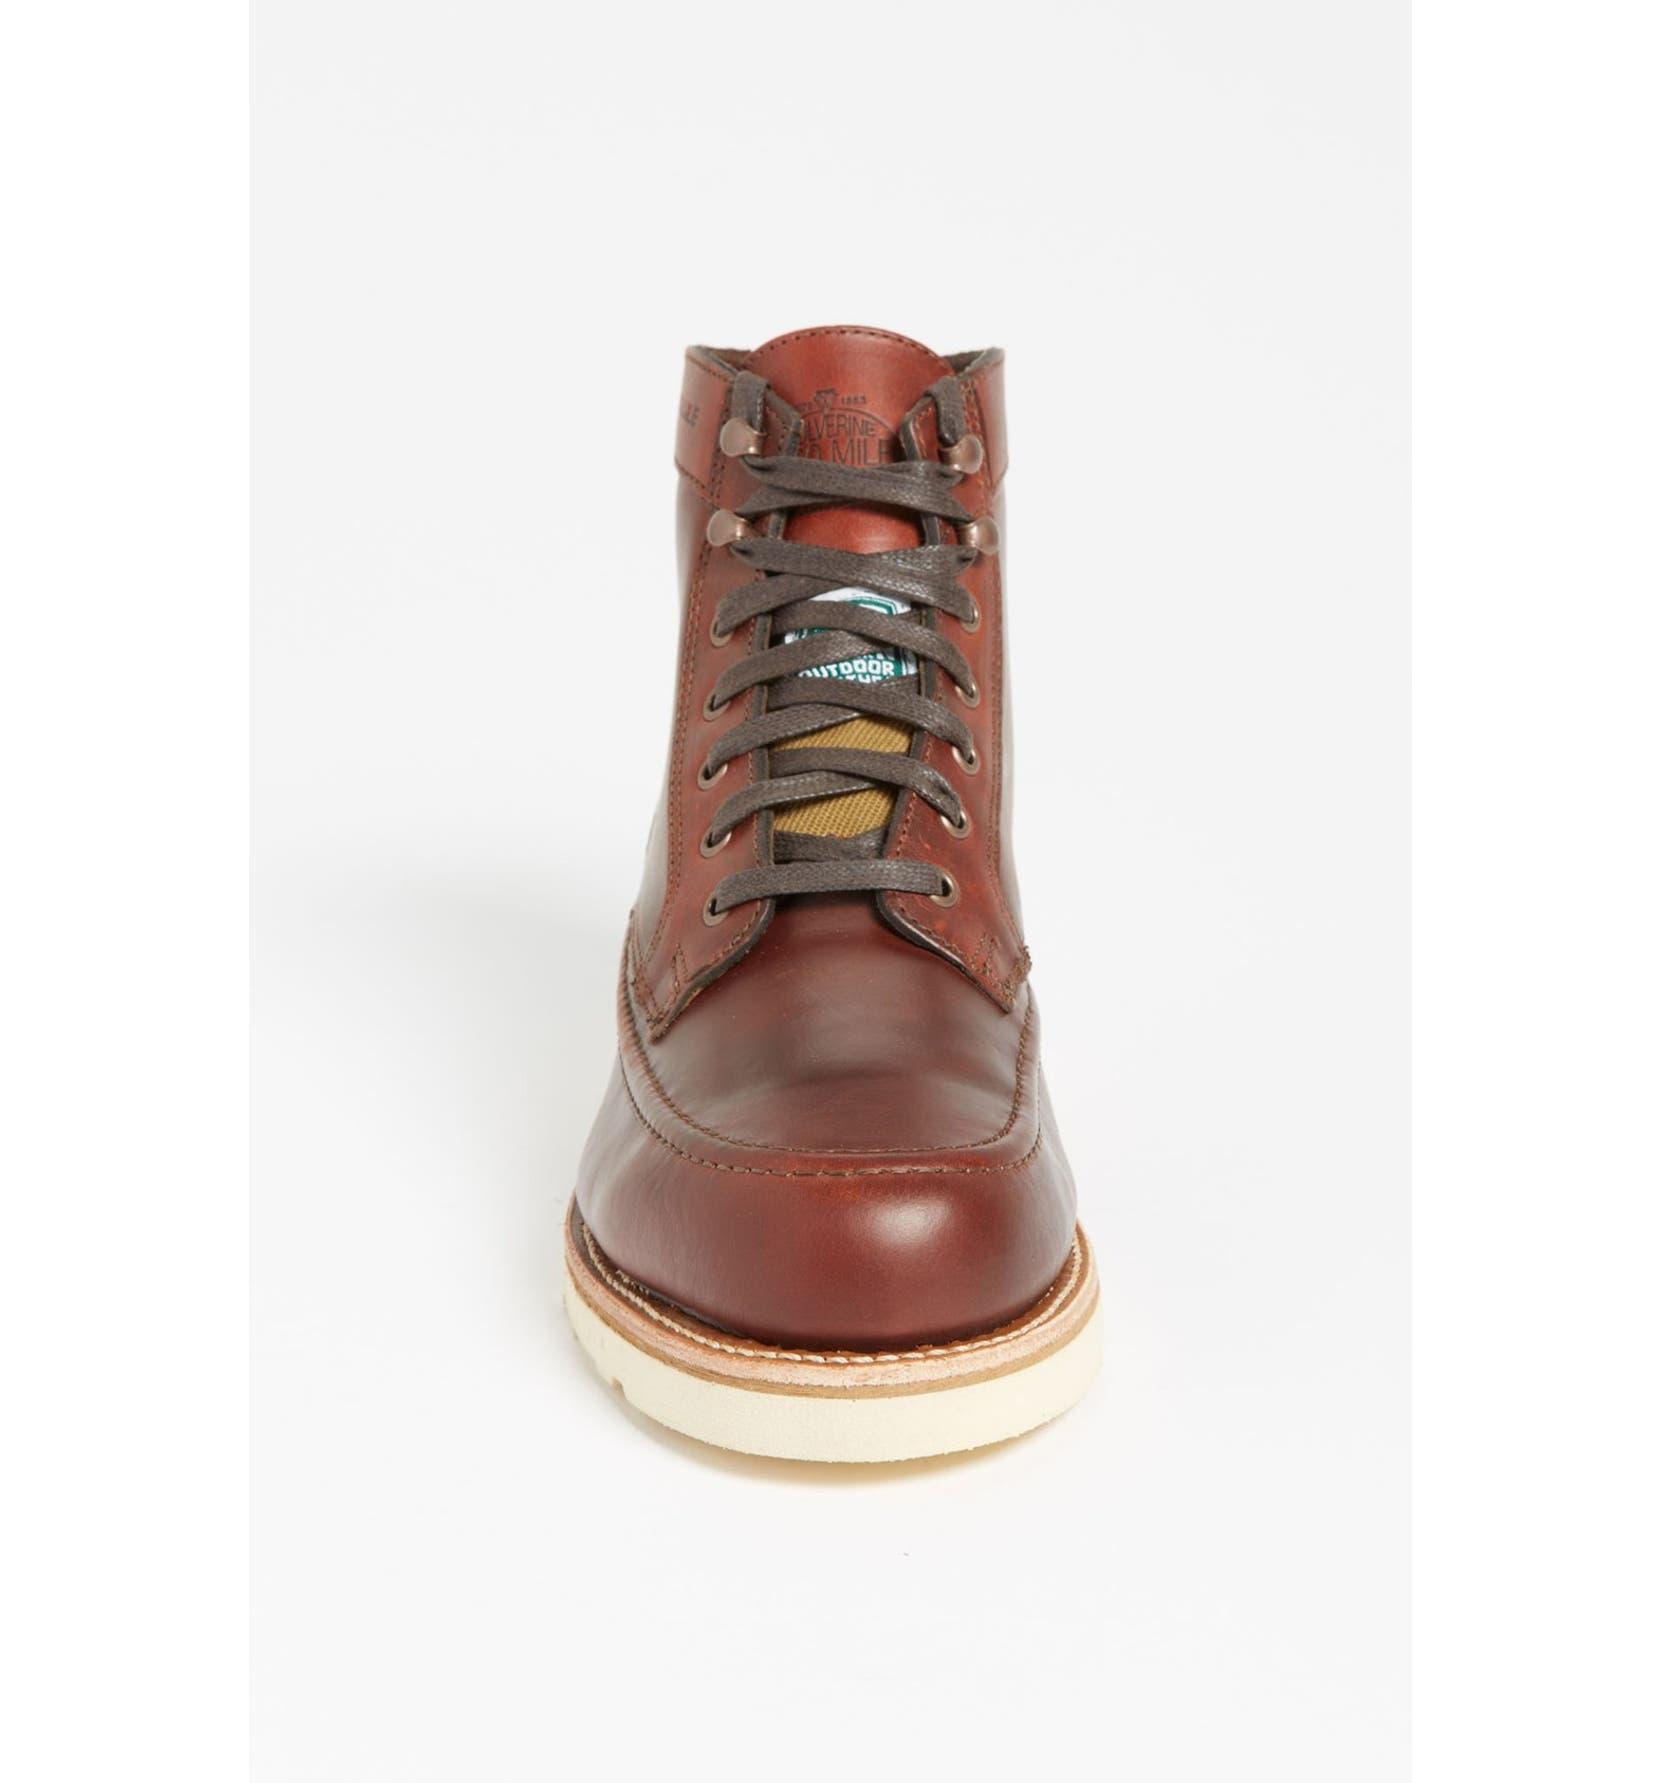 5a4741a1cf1 '1000 Mile - Emerson' Moc Toe Boot